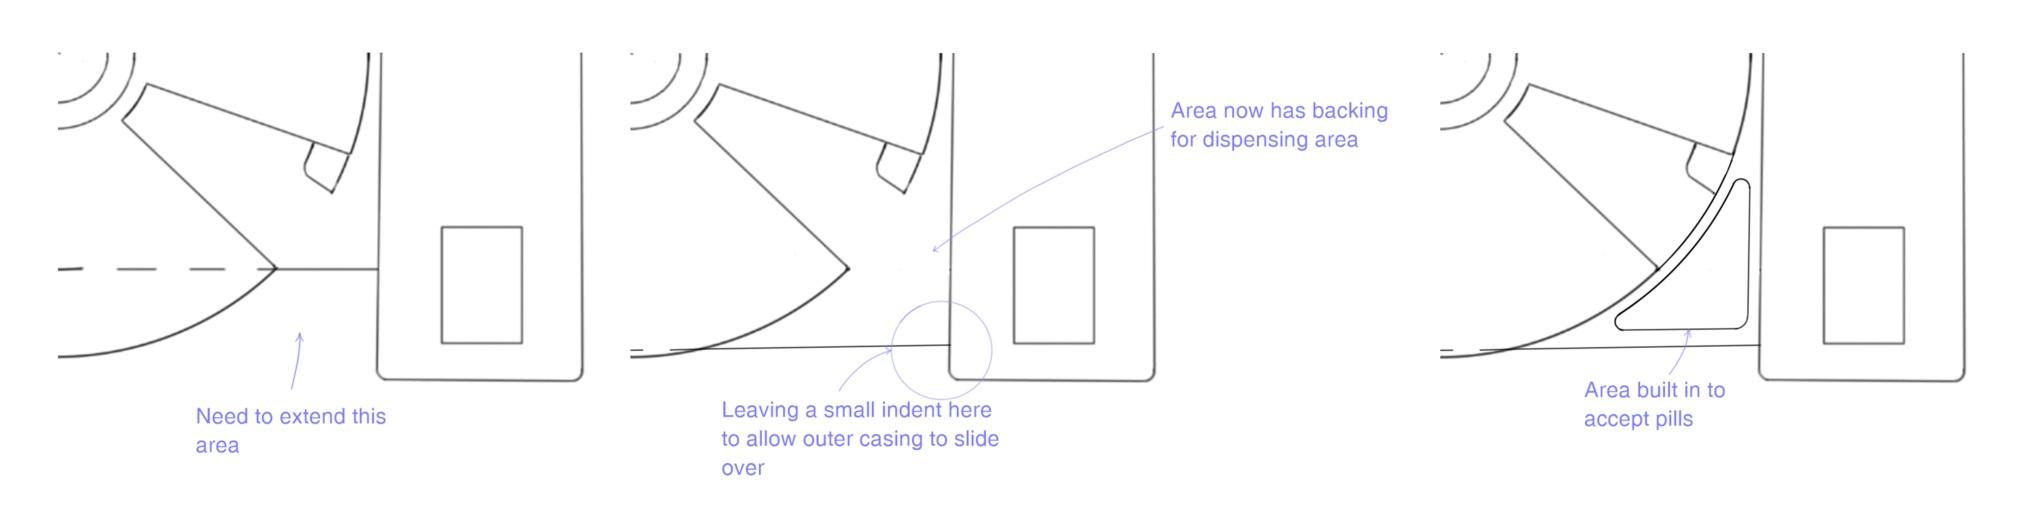 Dispensing+area+combined.jpg